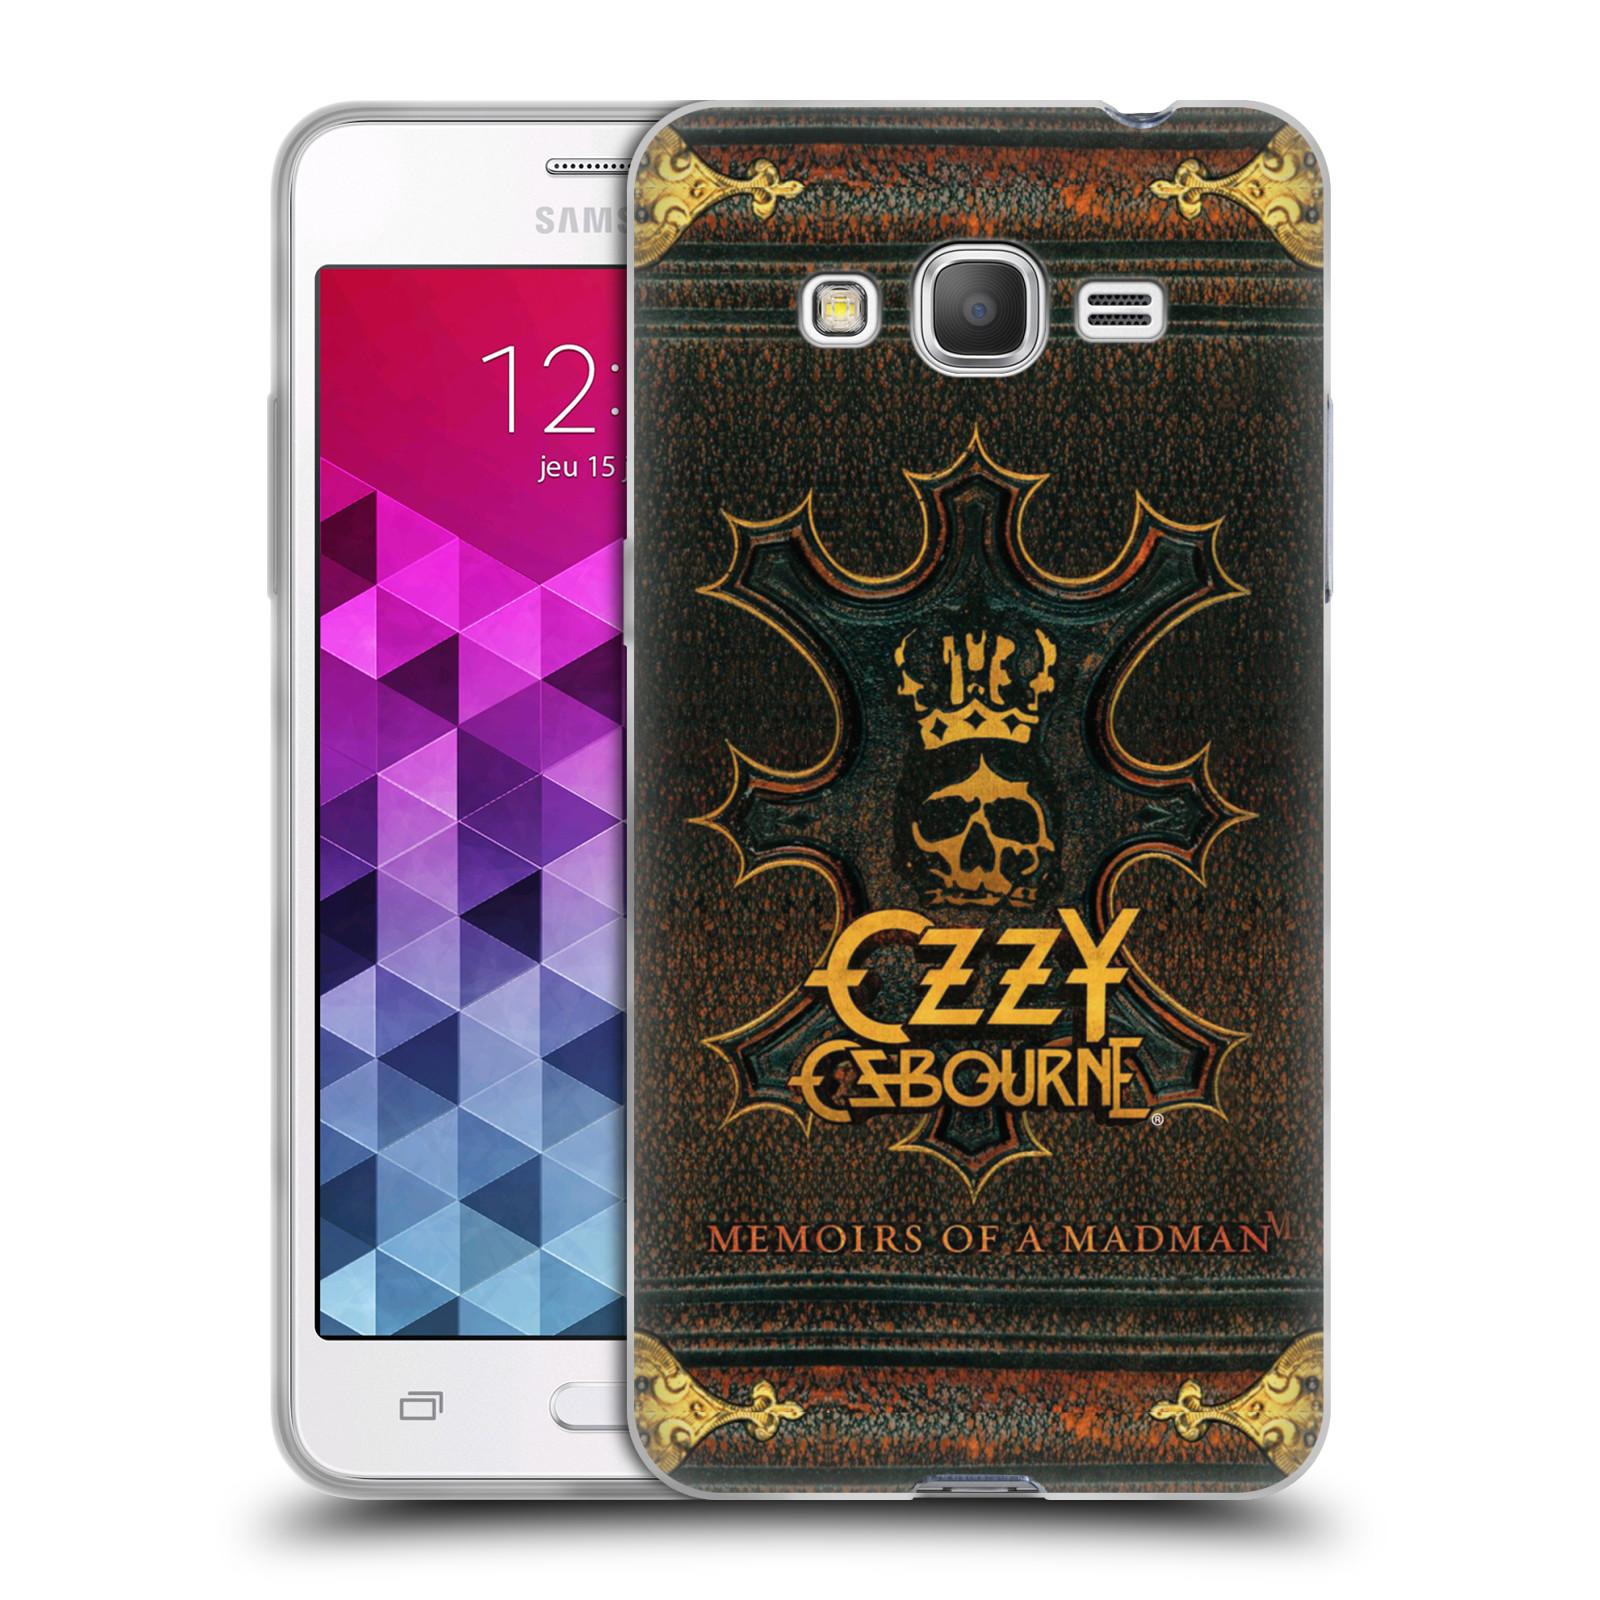 HEAD CASE silikonový obal na mobil Samsung Galaxy Grand Prime zpěvák Ozzy Osbourne koruna